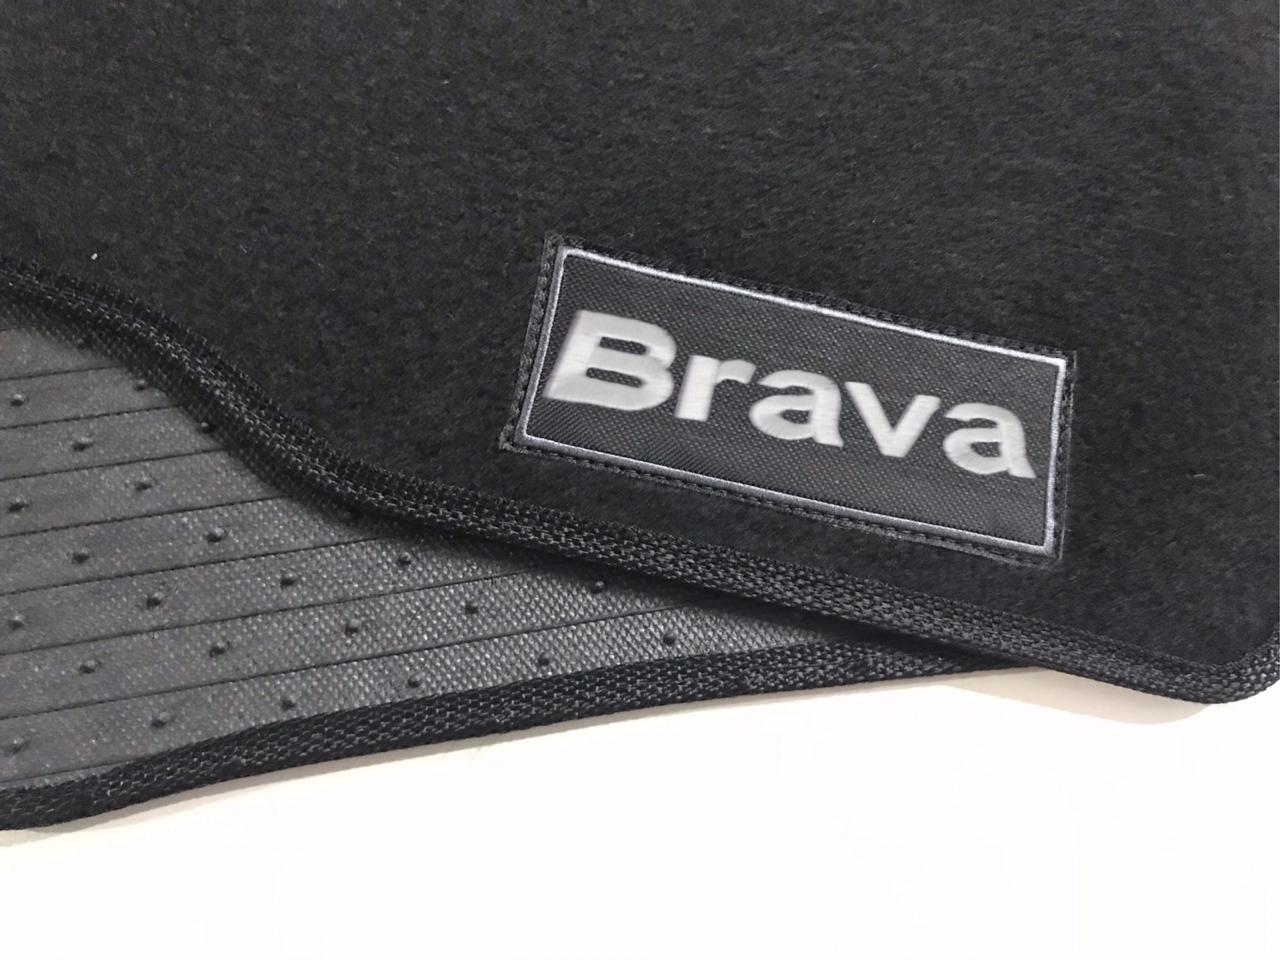 Tapete Fiat Brava Carpete Exclusiv Base Pinada